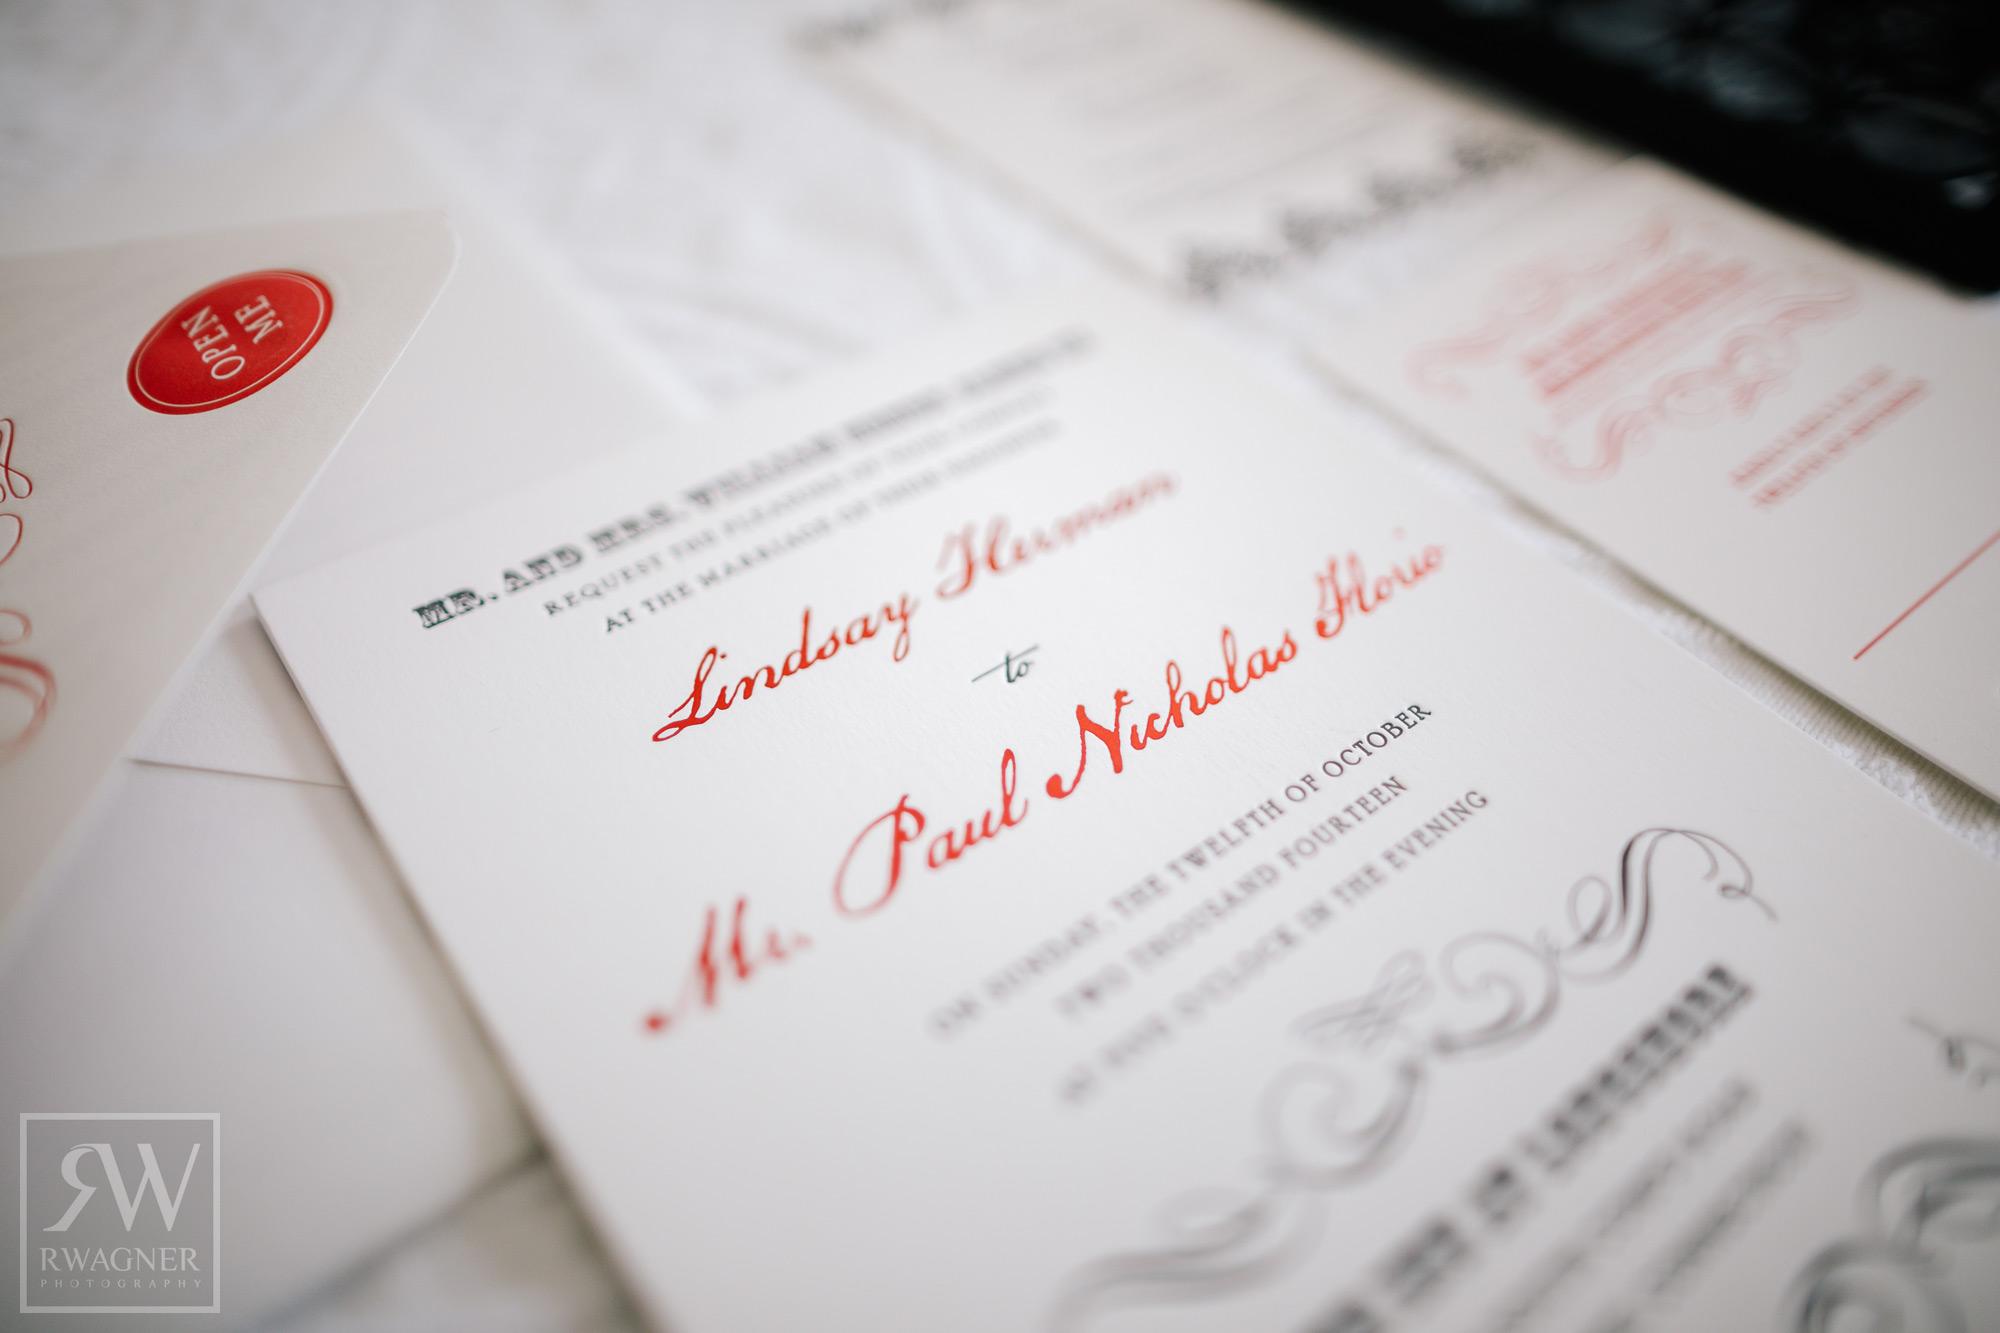 ceci_new_york_luxury_wedding_invitations_couture_red_black_white_real_wedding_dramatic_inn_at_longshore_v286_6.jpg